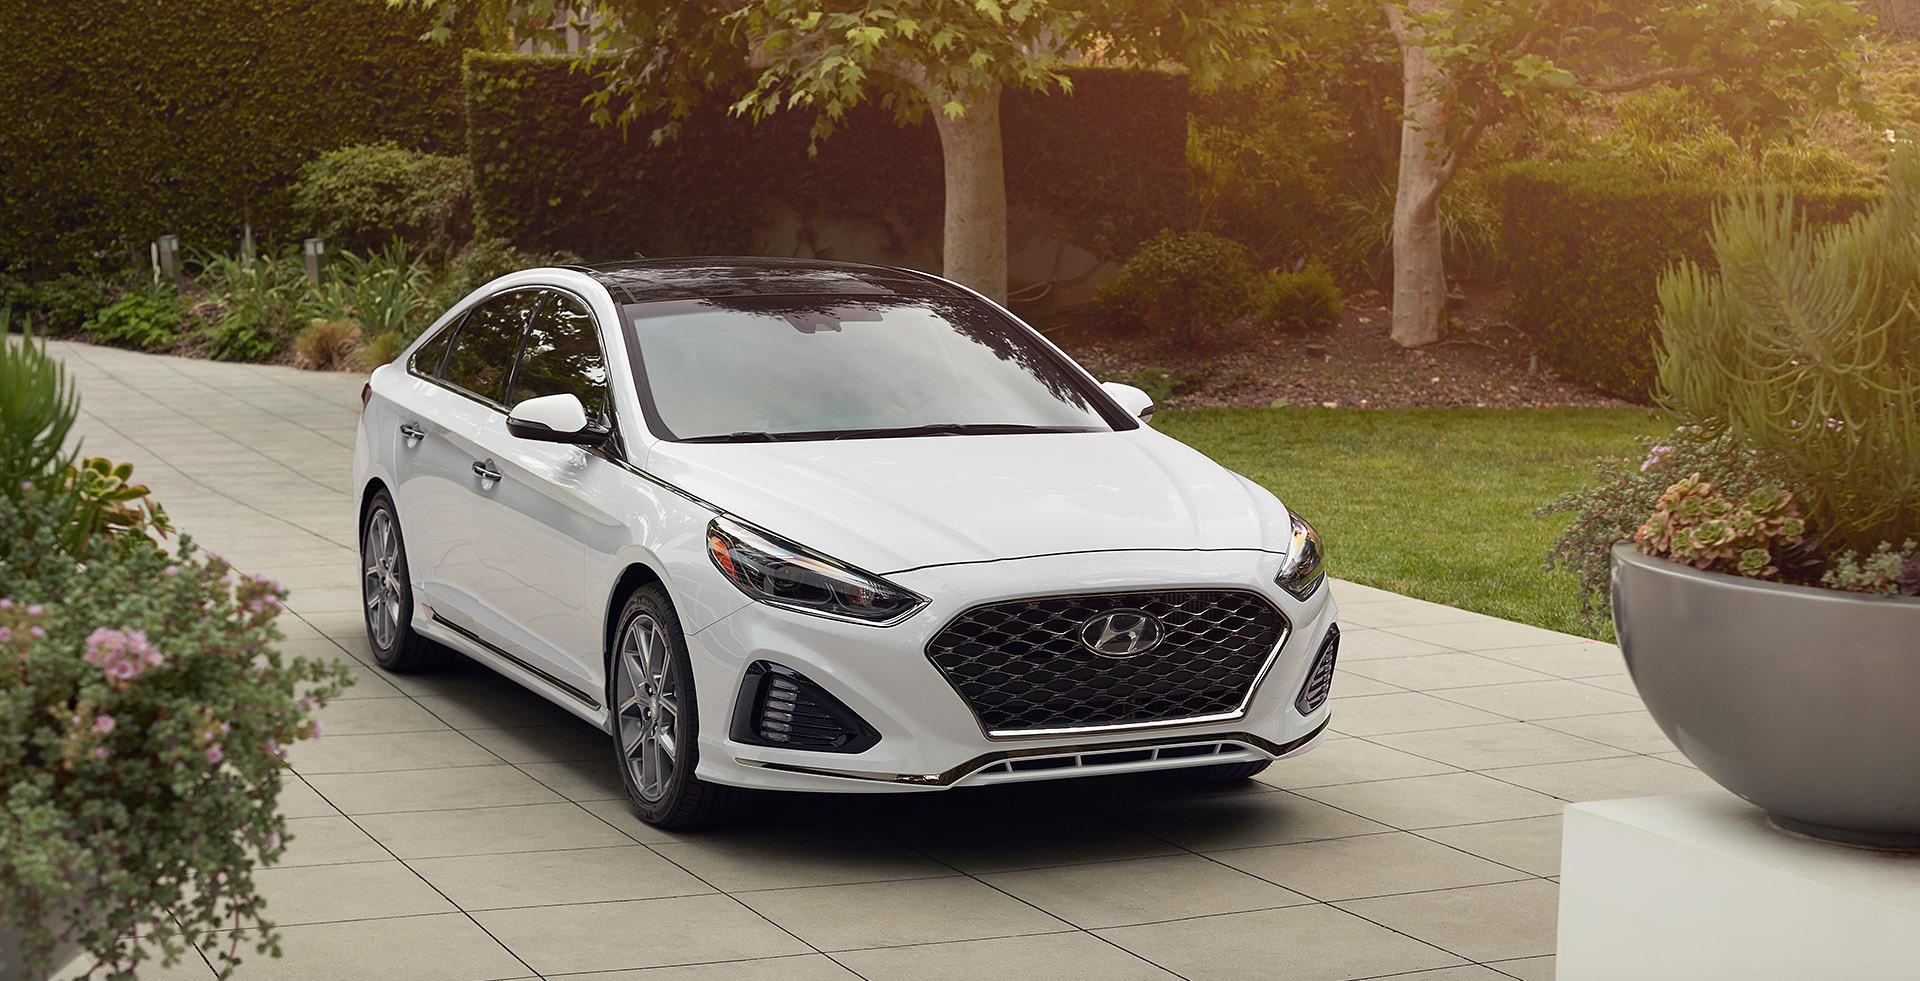 Used Hyundai Sonata for Sale near Cicero, IL